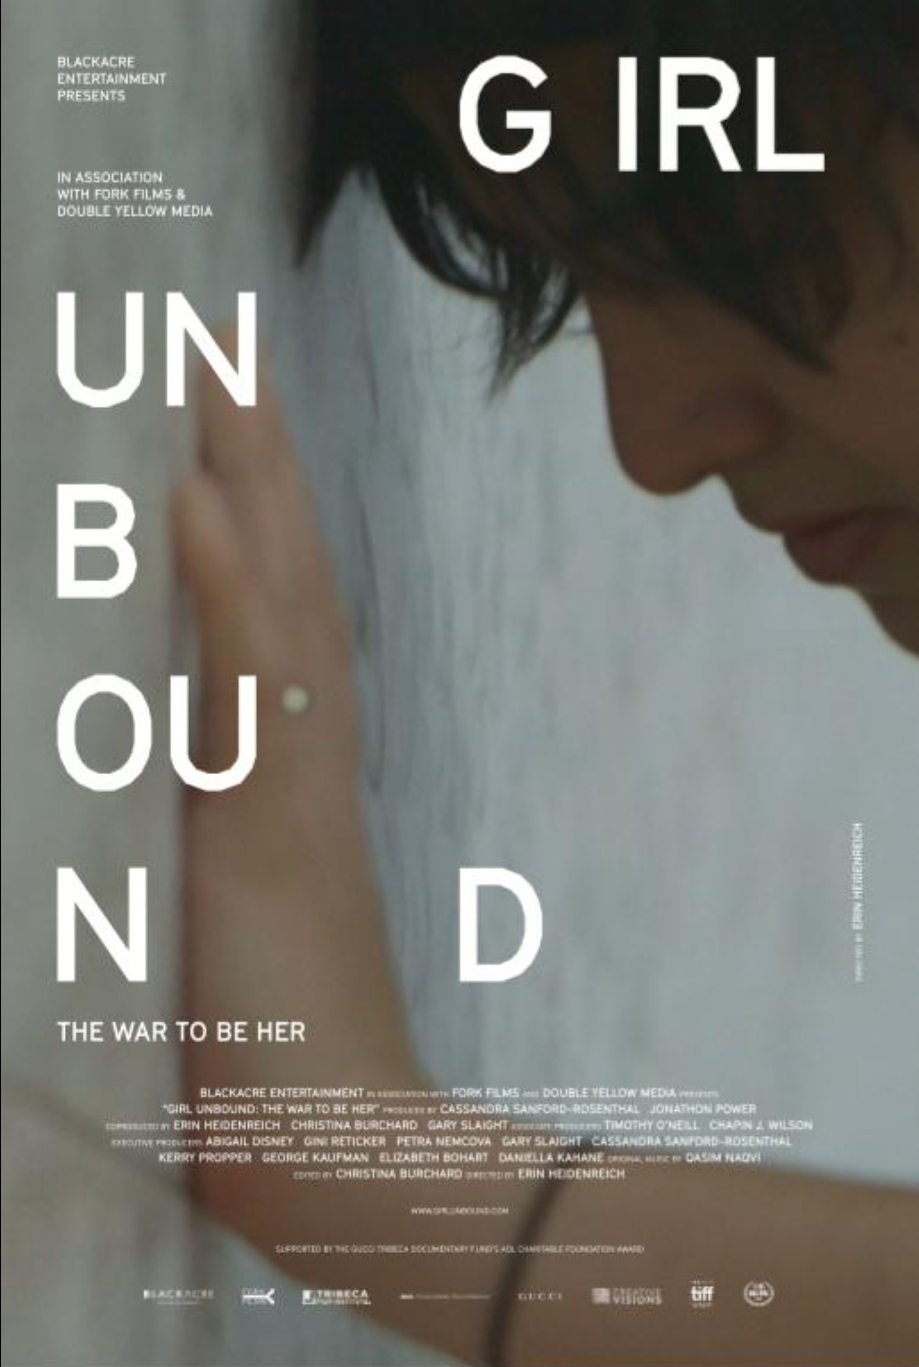 GIRL UNBOUND - Directed by Erin HeidenreichAdditional Music by Jessica Weiss and Shruti Kumar